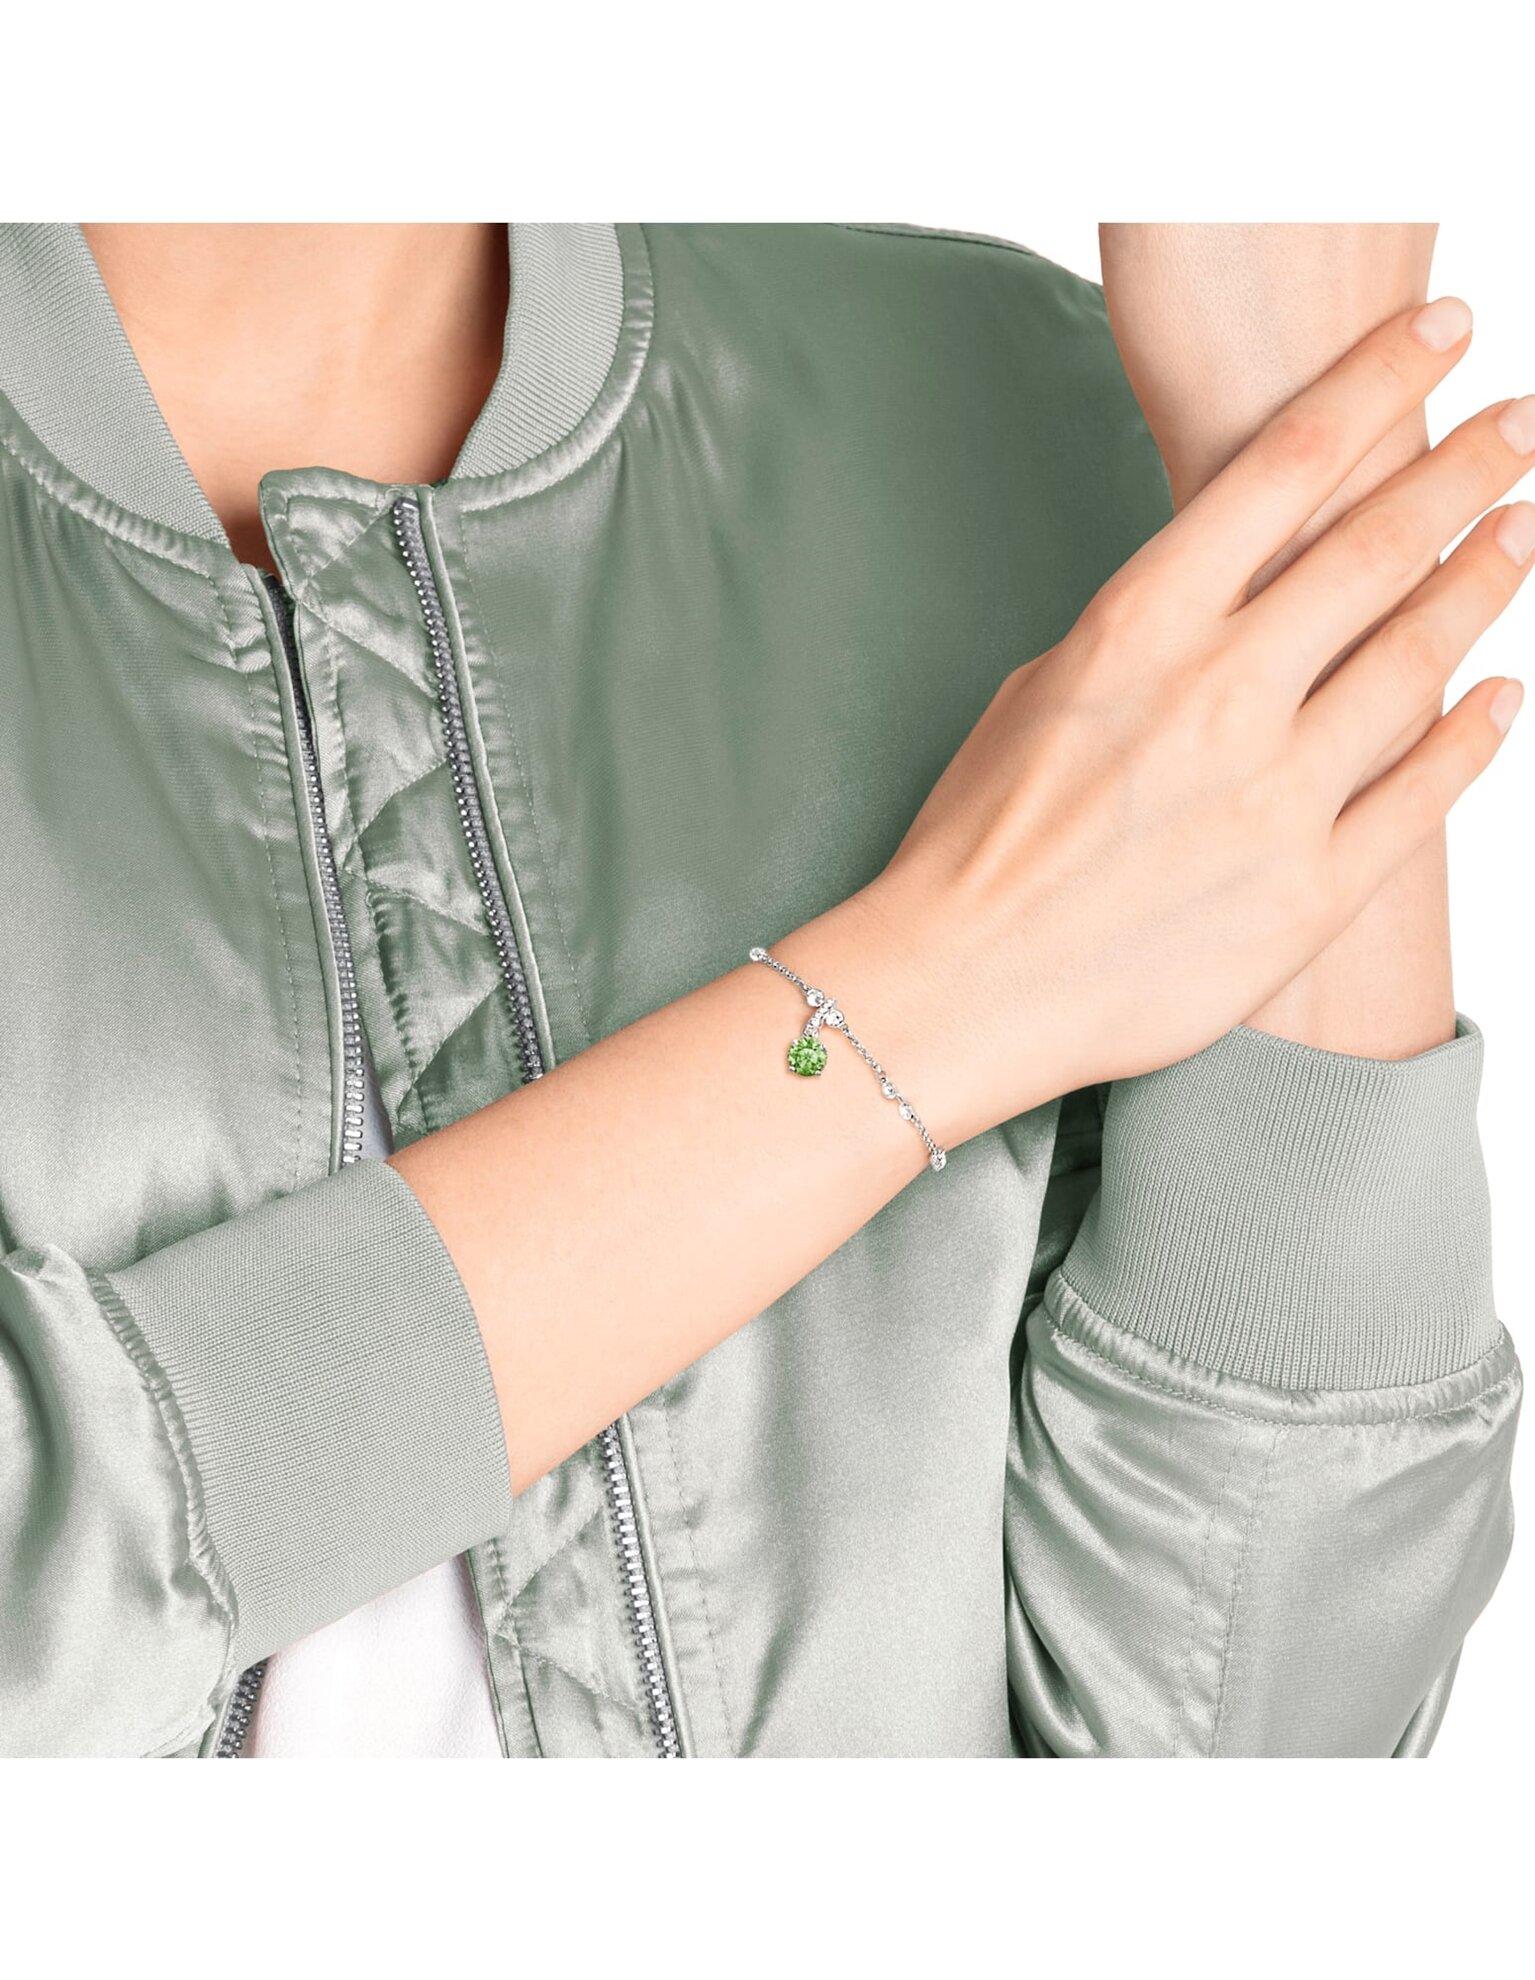 Picture of Swarovski Remix Collection Charm, Ağustos, Açık yeşil, Rodyum kaplama